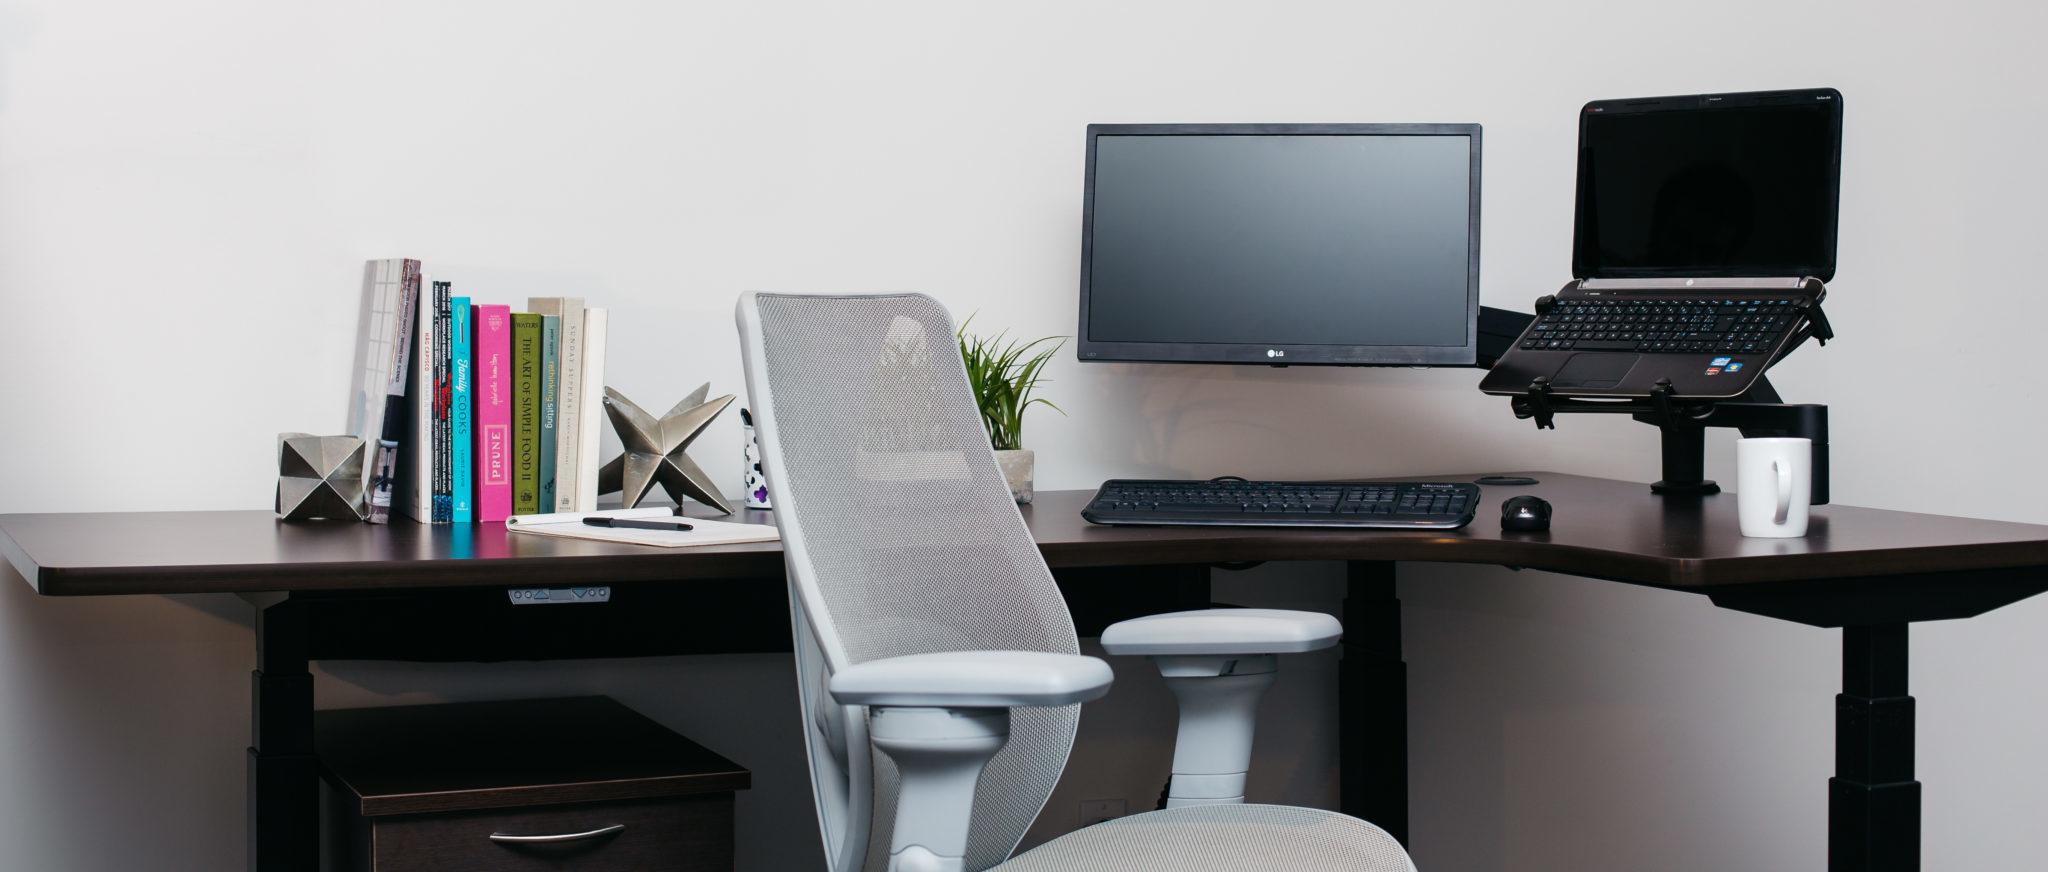 home office ergonomics. home office ergonomics cover photo v2 cropped again p